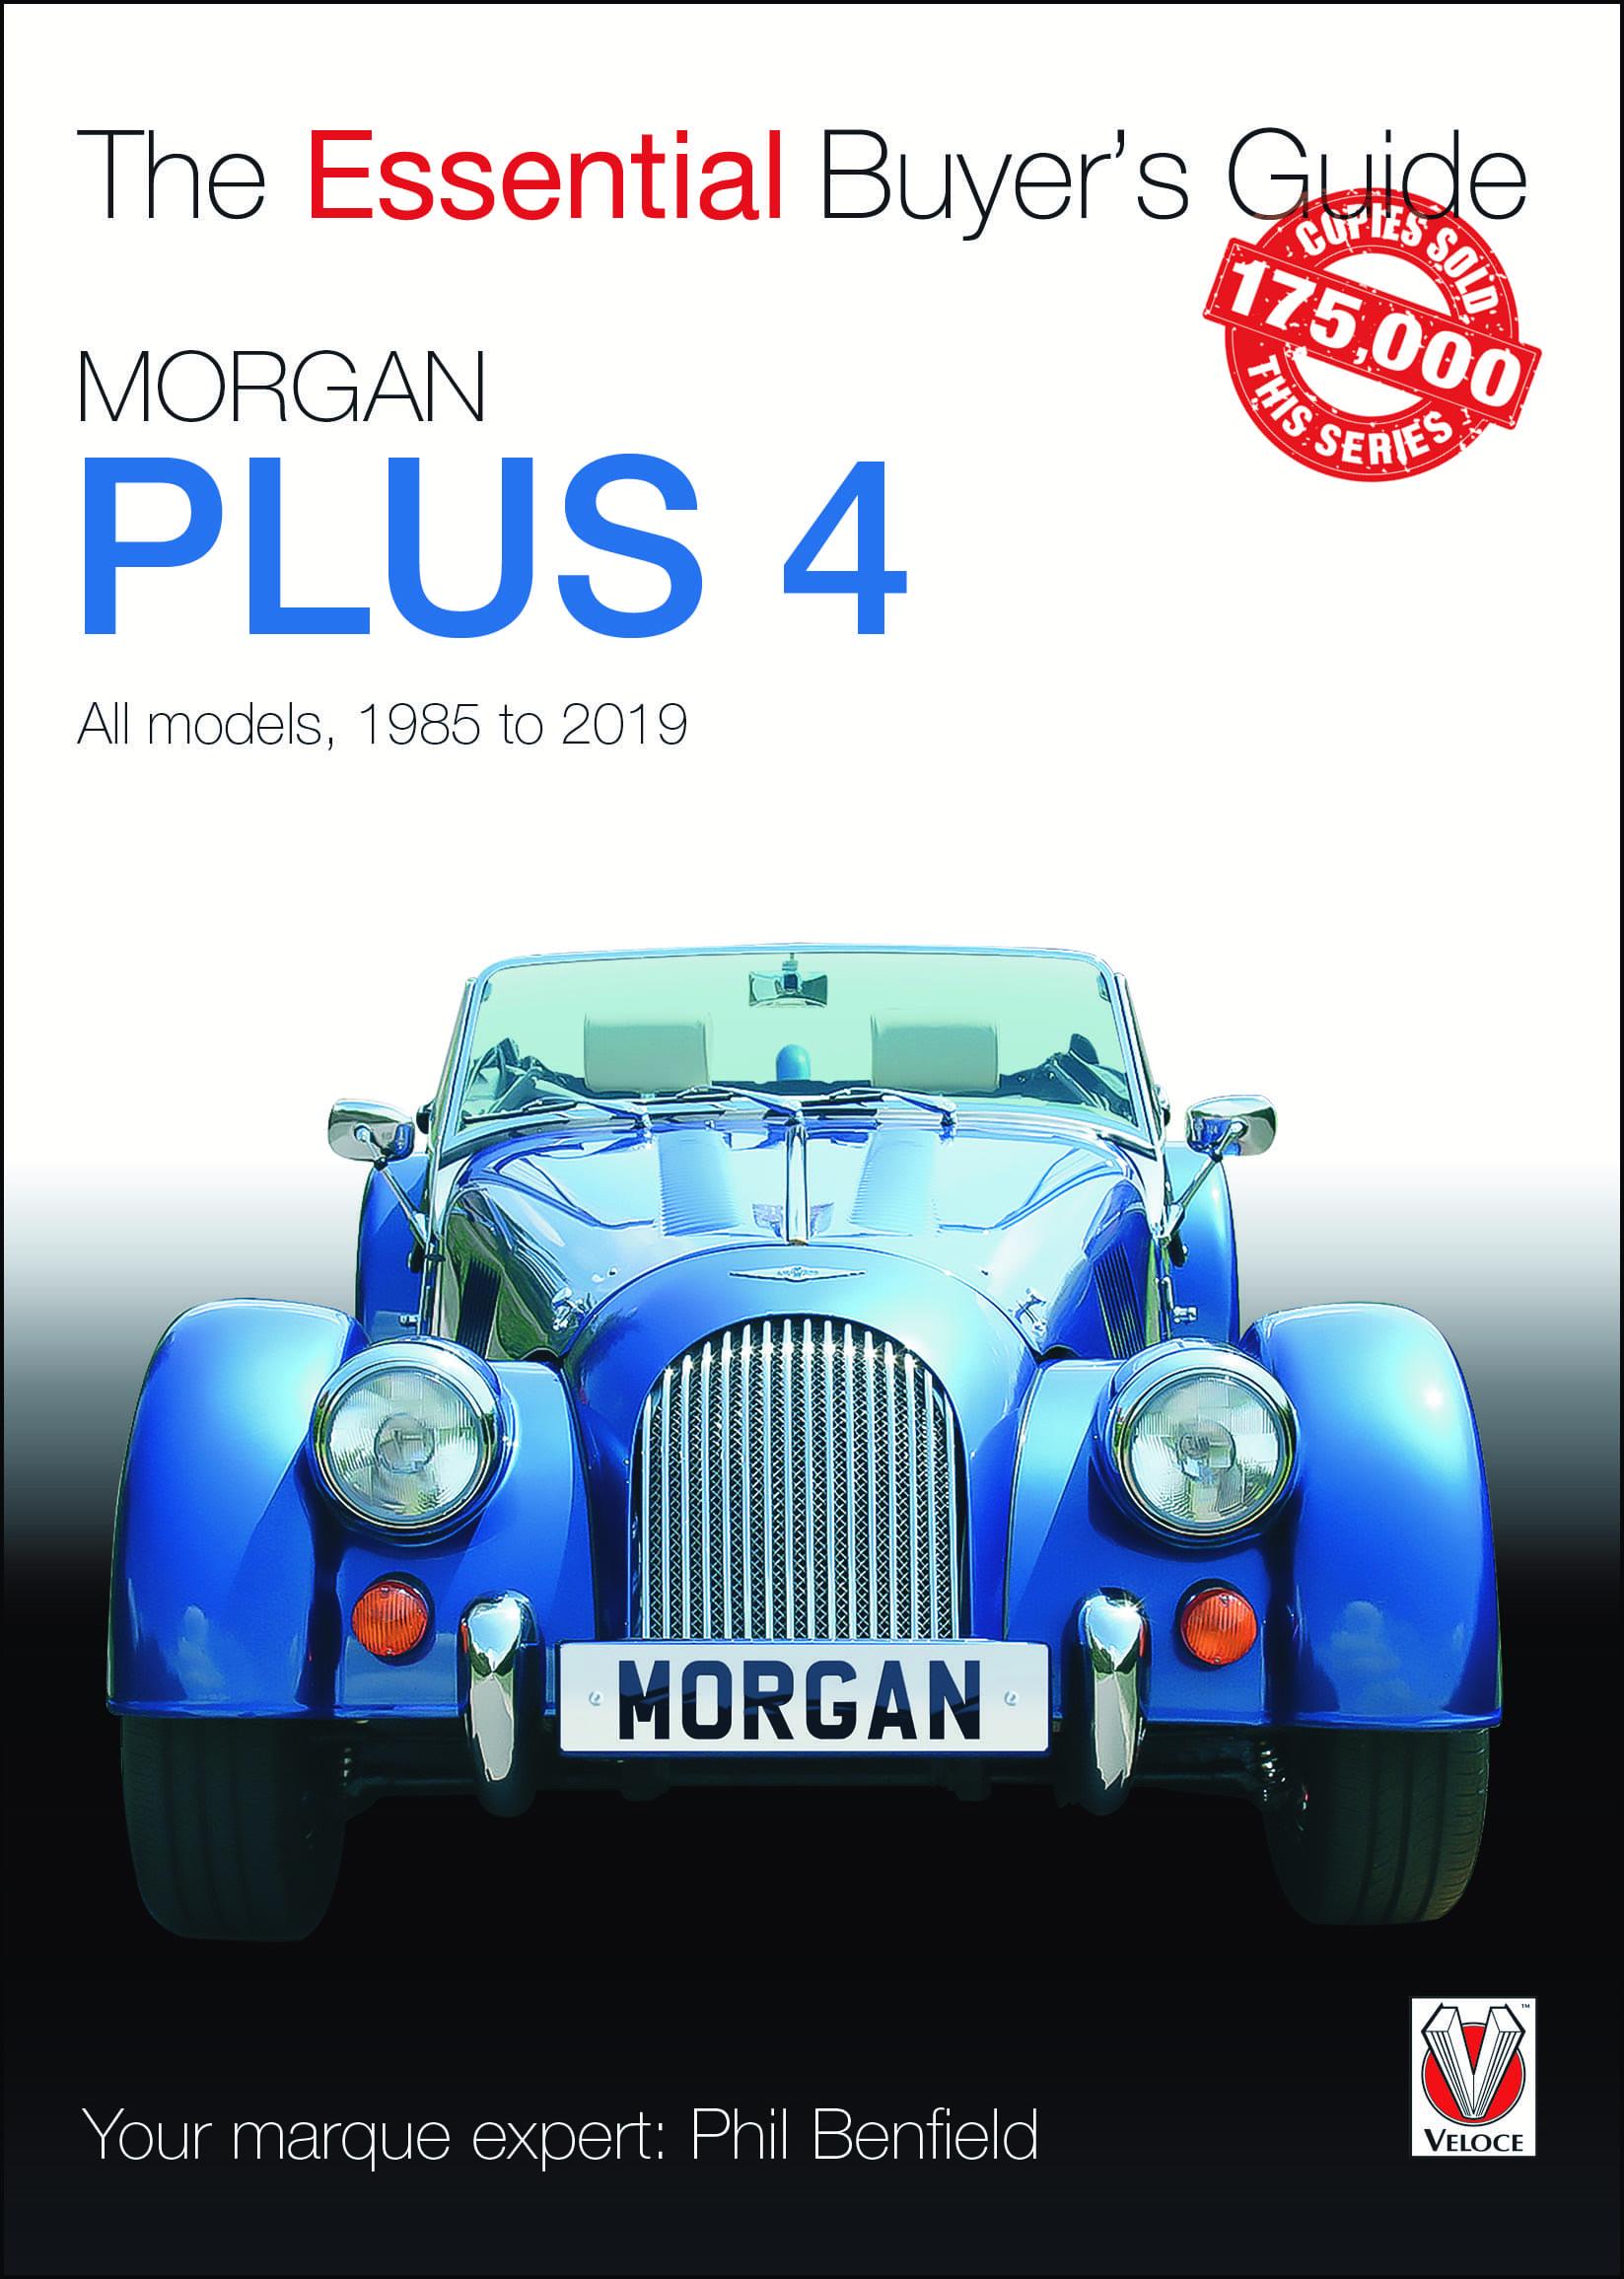 Morgan Plus 4 EBG cover